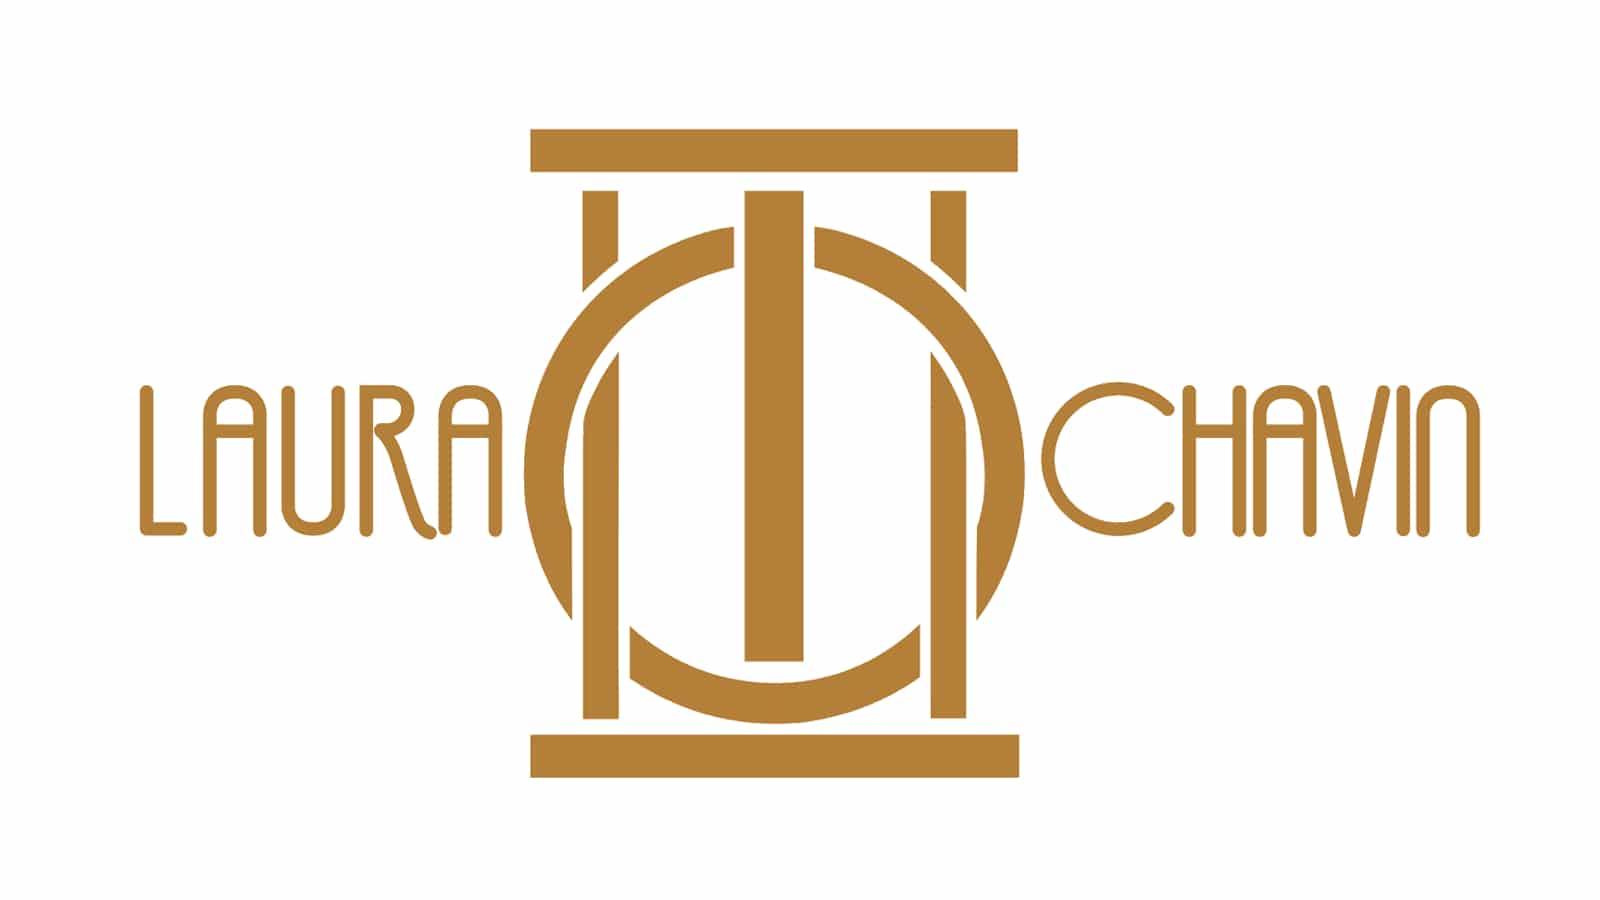 Laura Chavin Logo